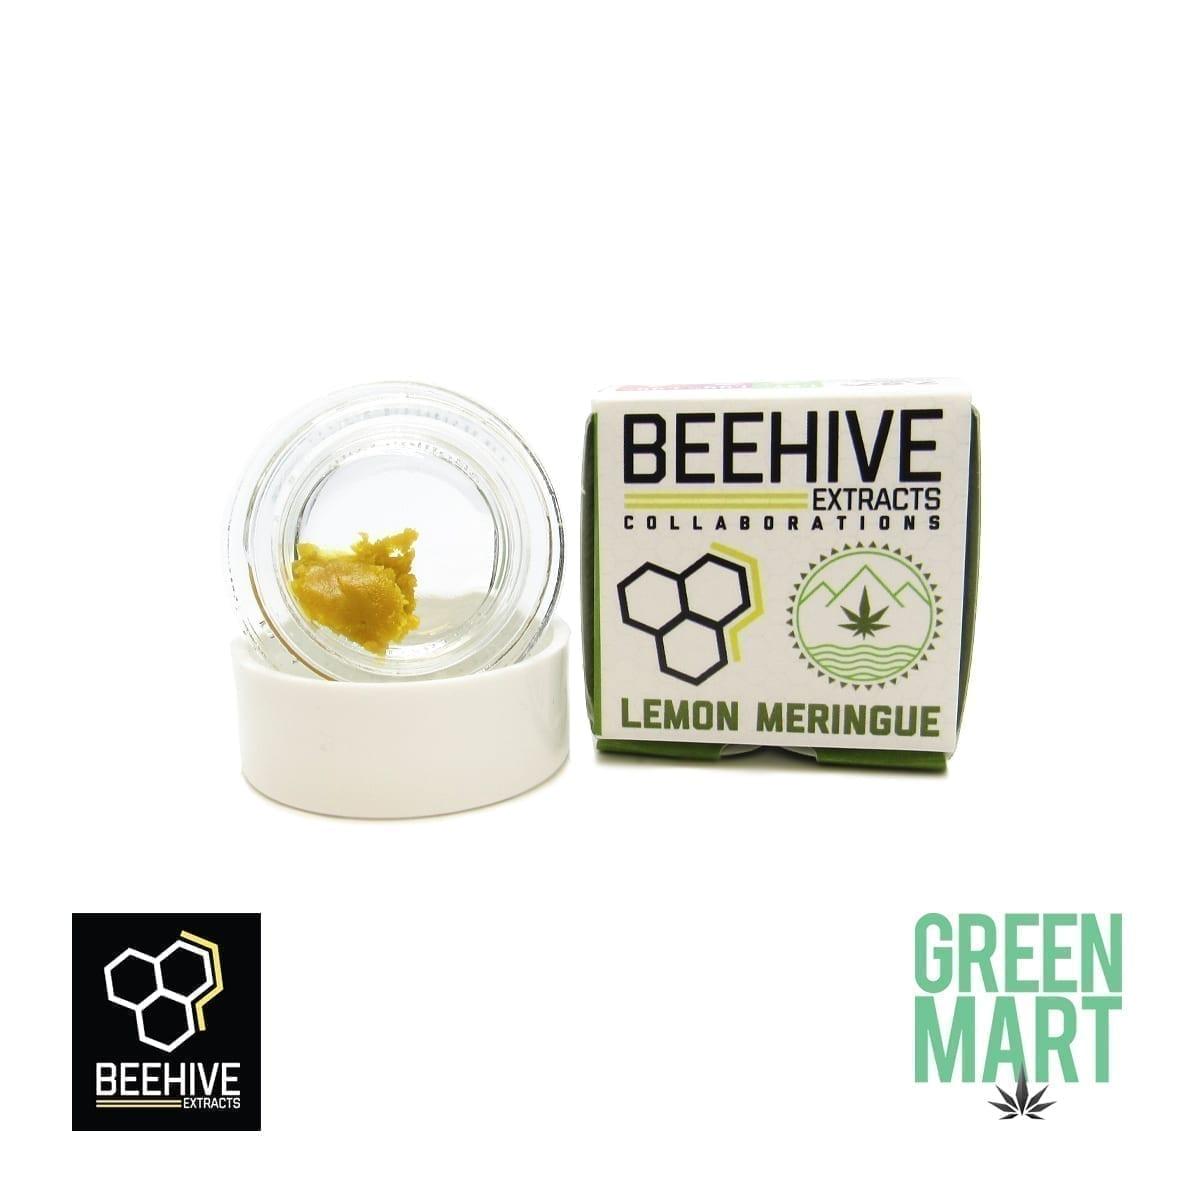 Bee Hive Extracts - Lemon Meringue Badder